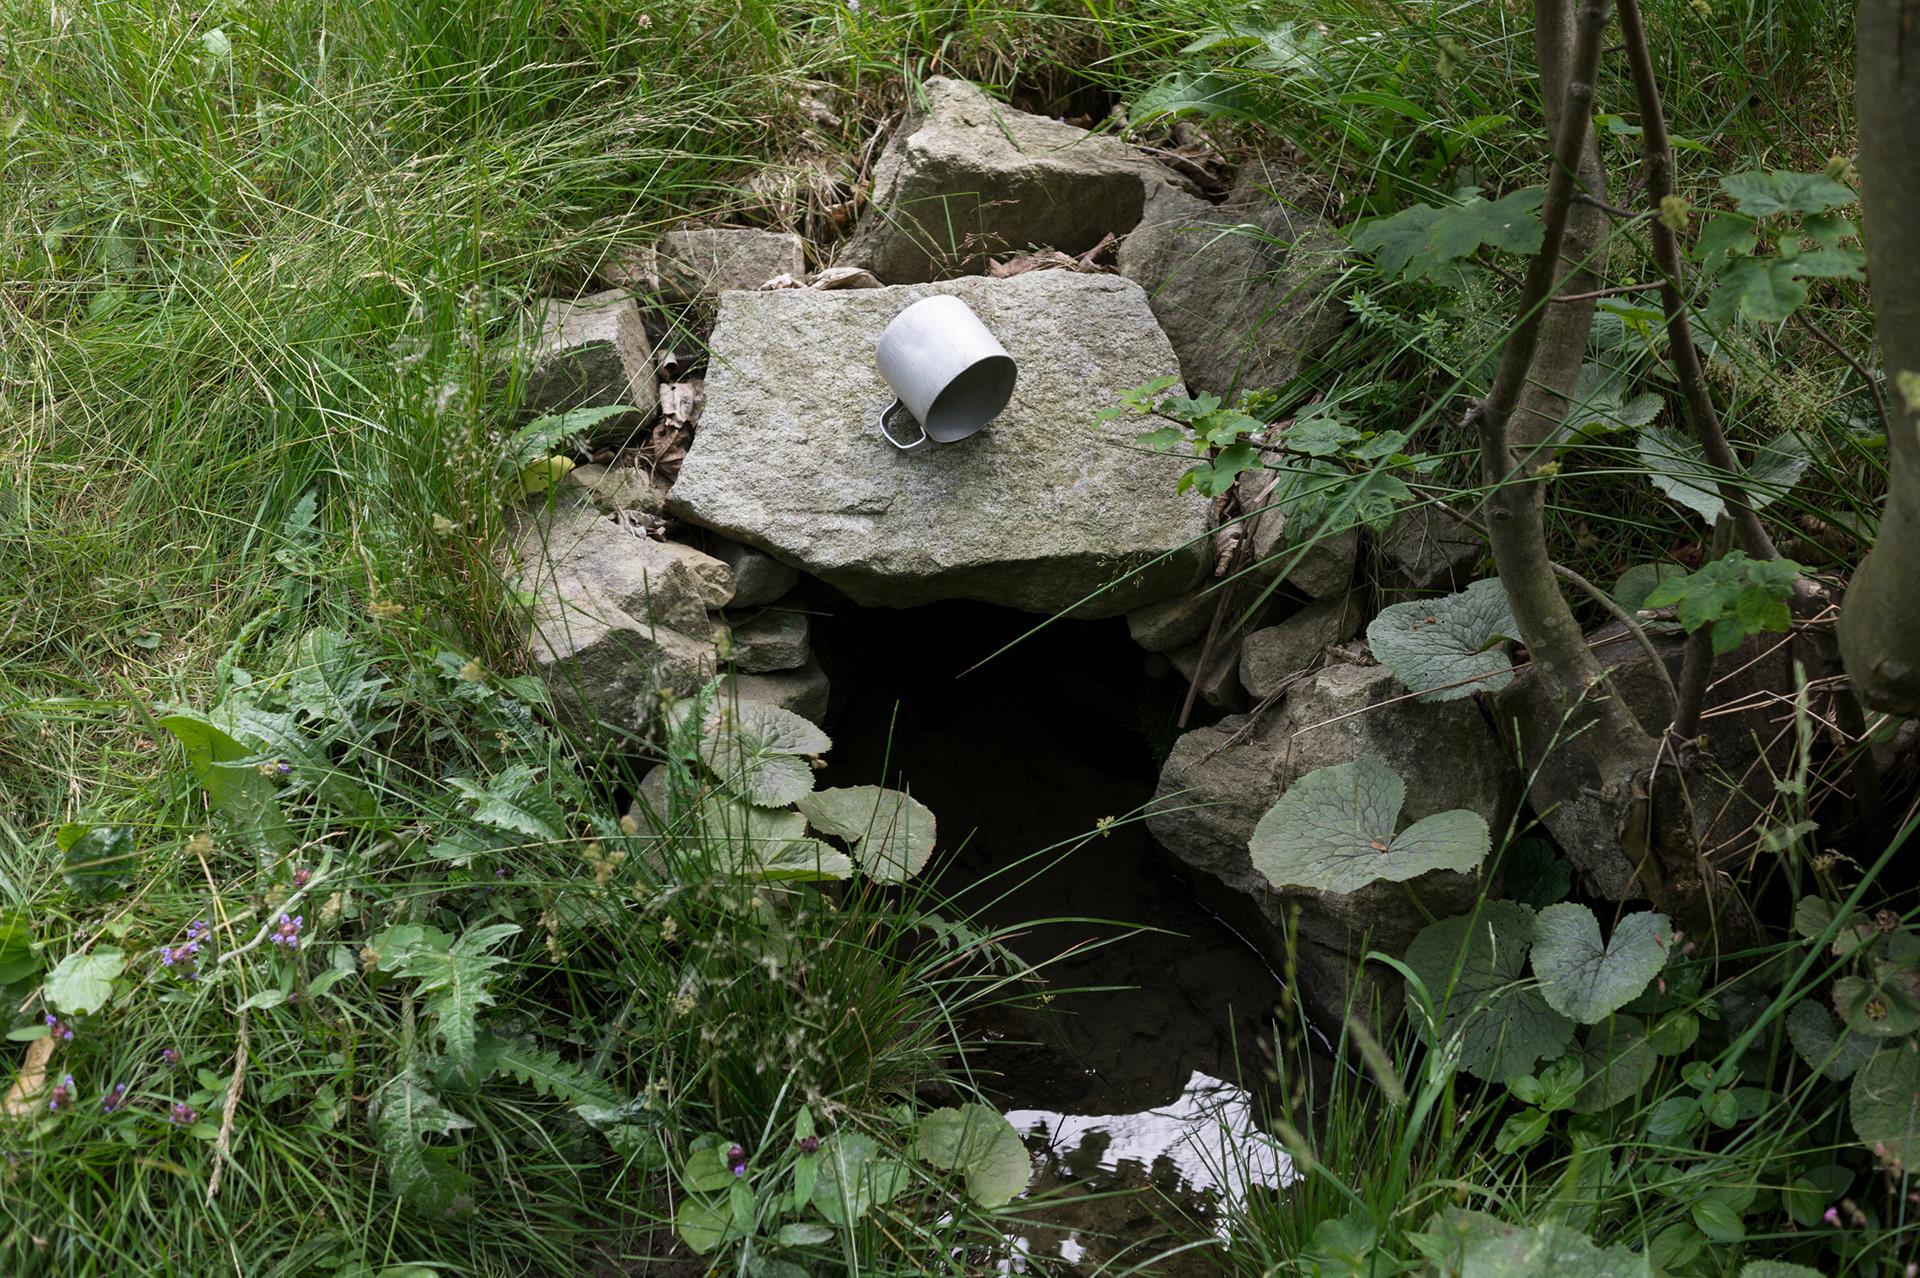 Tin mun in the nature, source of the Bystřice river, Vsetínské hills, Beskid mountains, Czech Republic